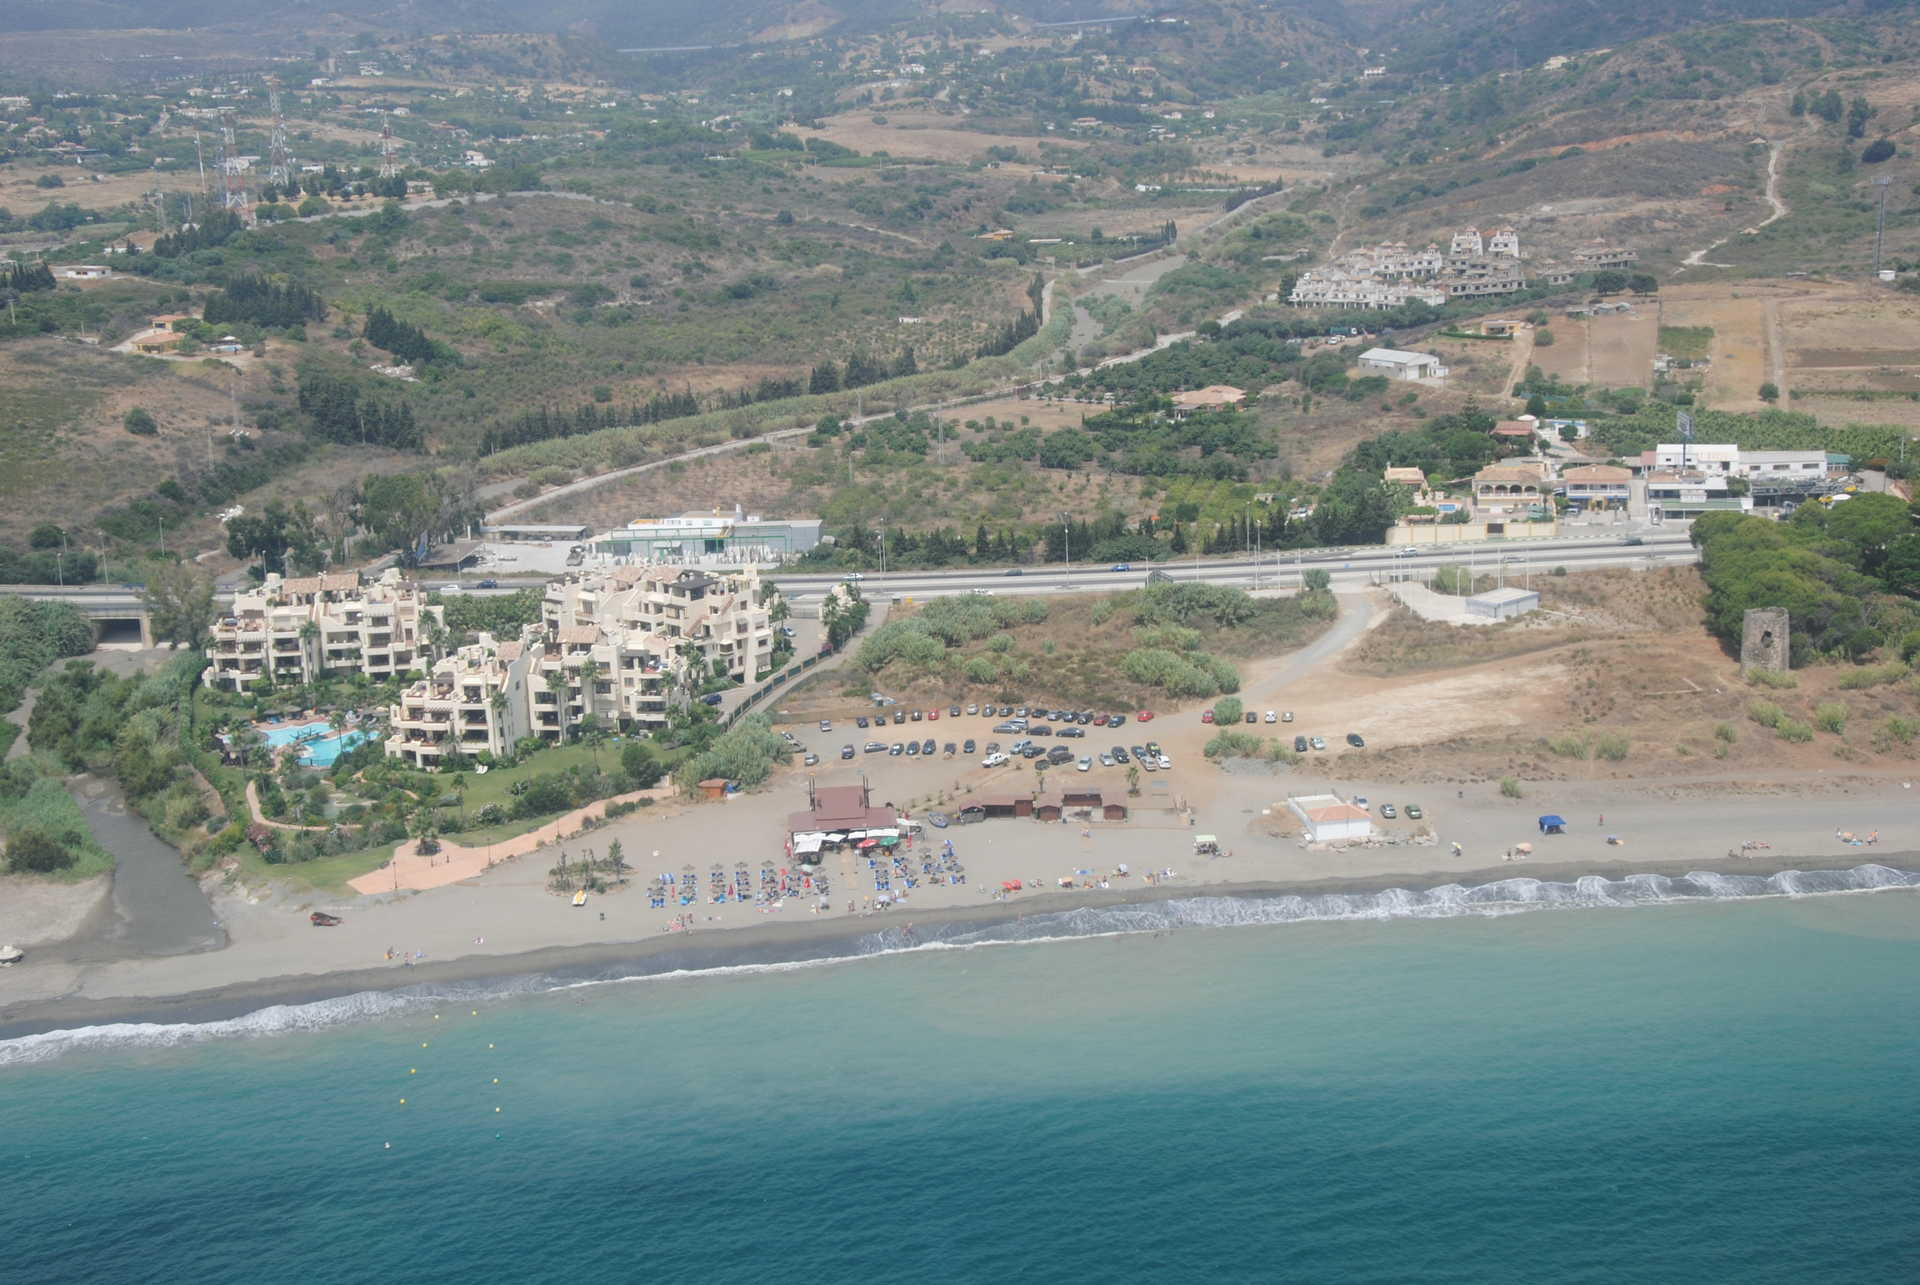 Playa El Velerín